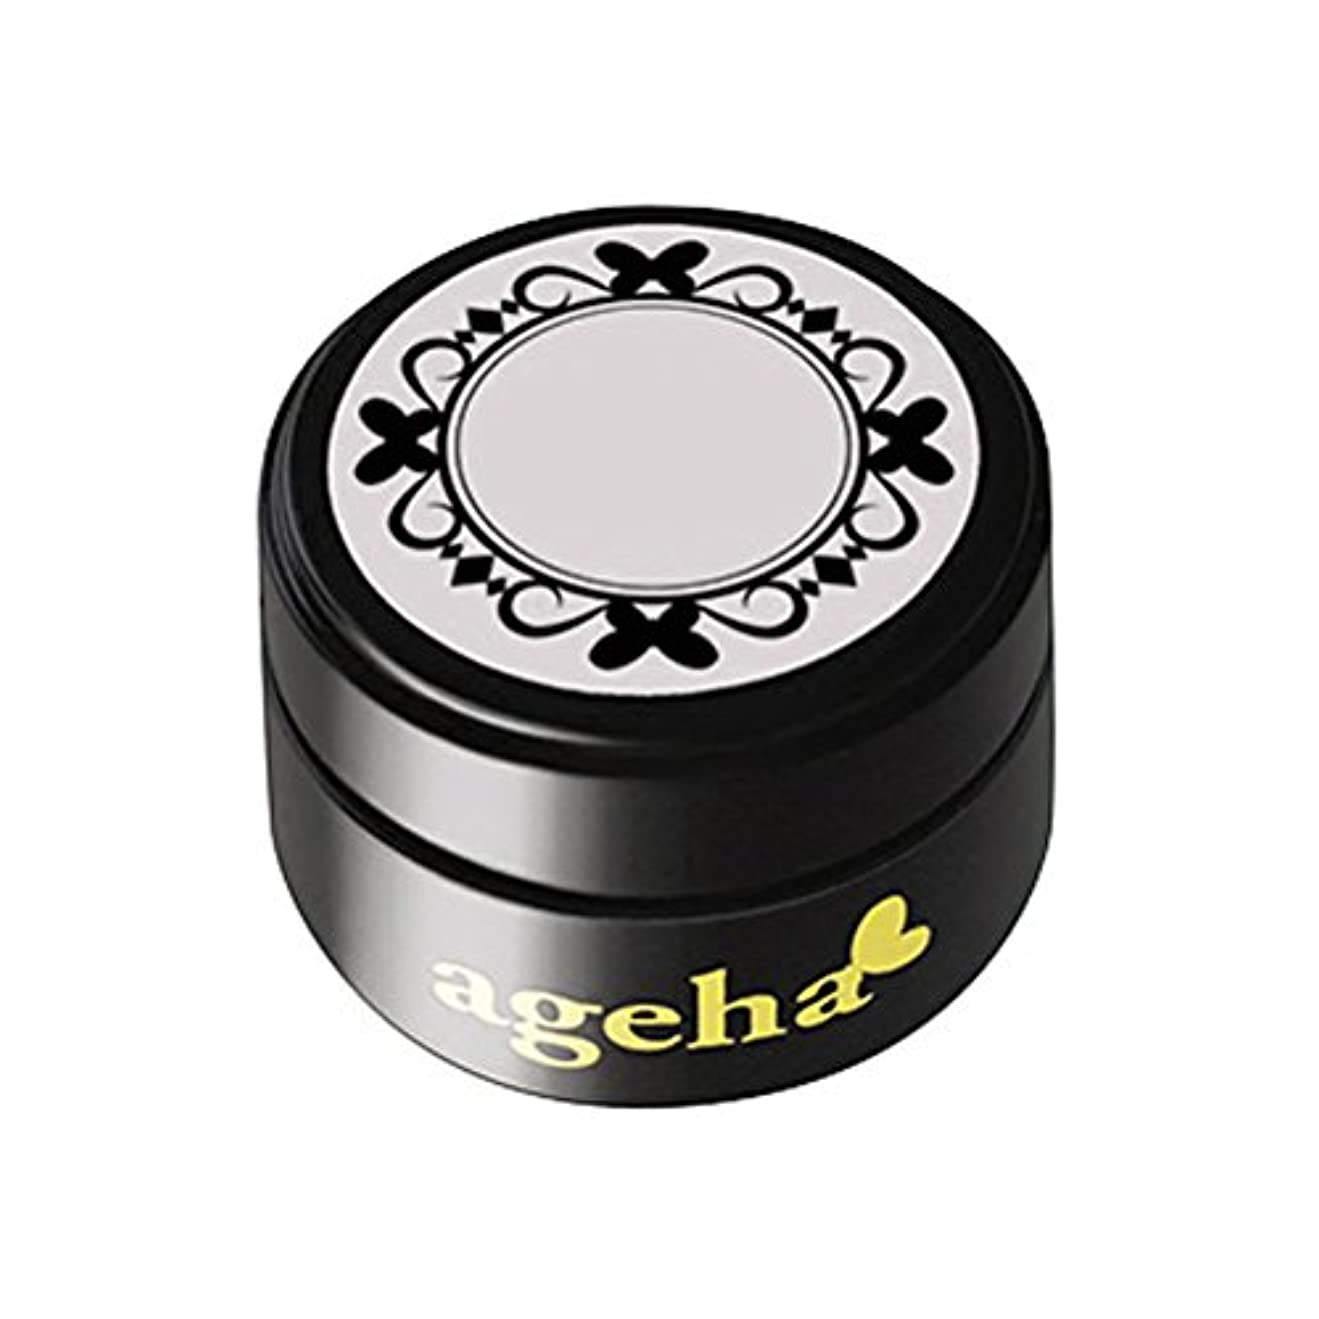 ageha gel カラージェル コスメカラー 200 ホワイト 2.7g UV/LED対応